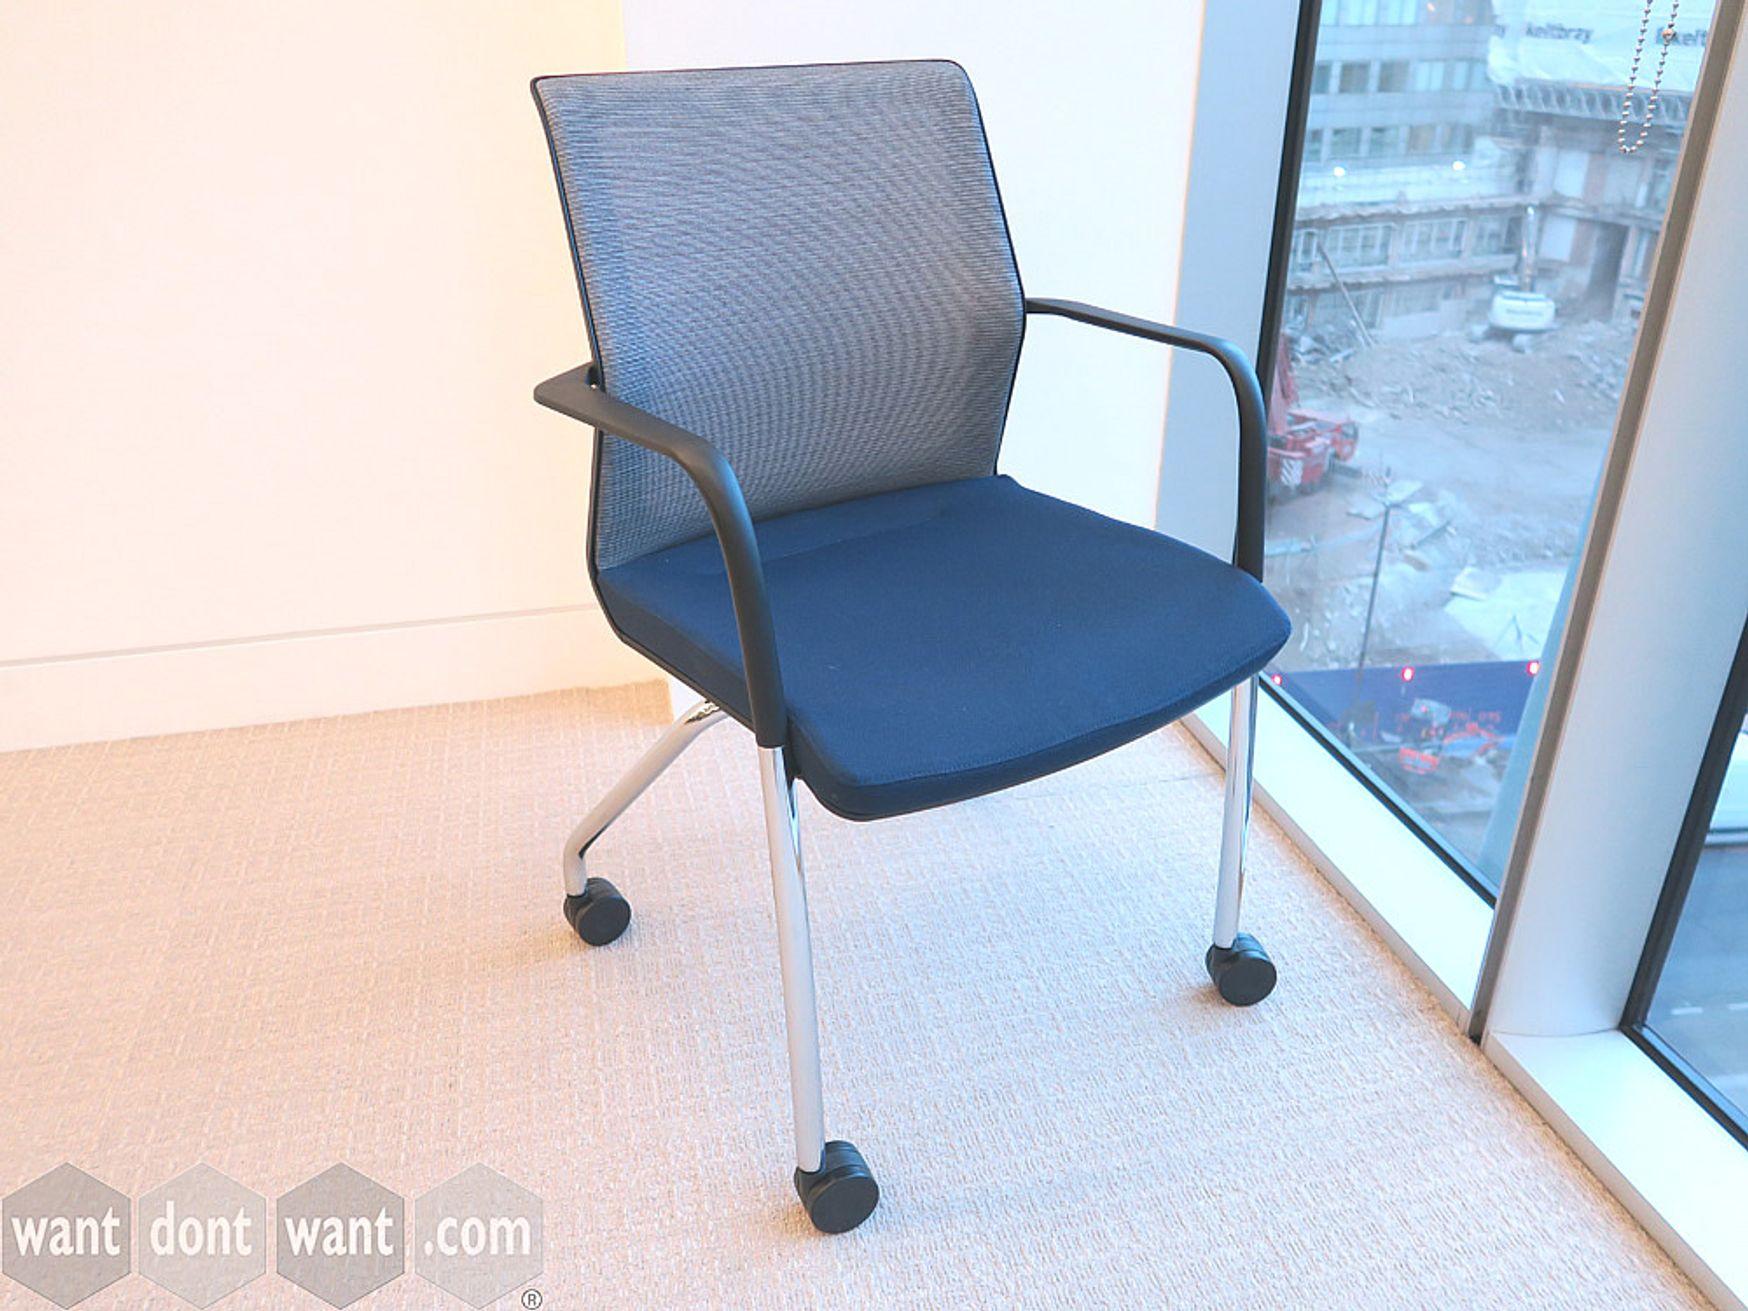 Used Orangebox 'Workday' Chair on Castors